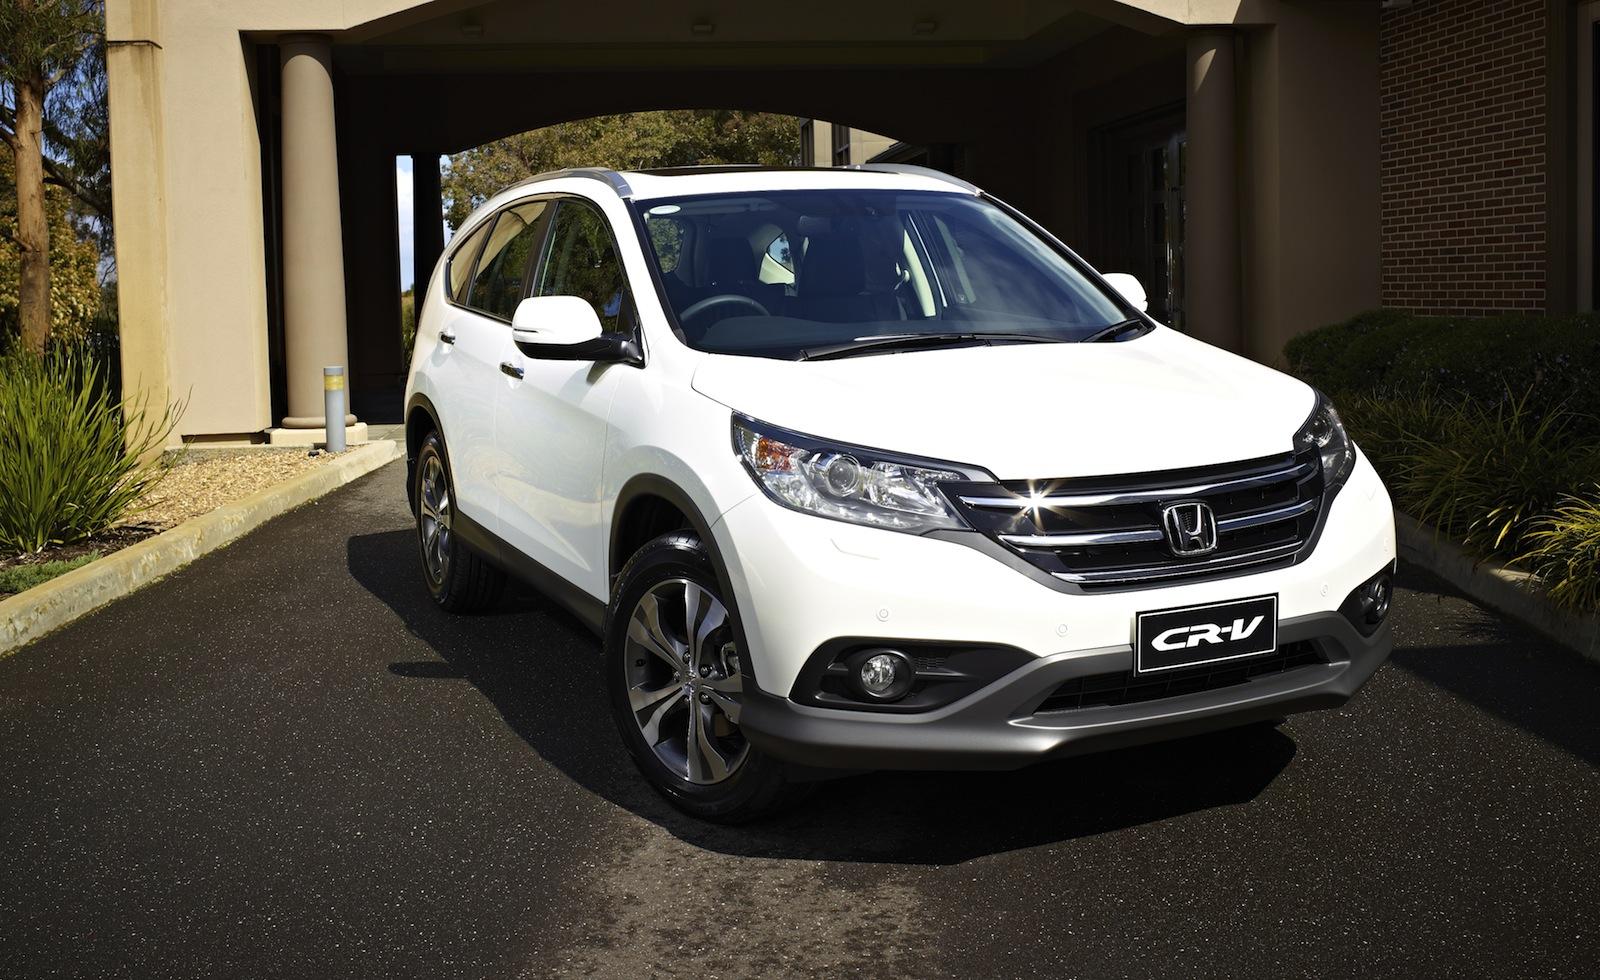 Honda cr v technical specifications and fuel economy for Honda cr v mpg